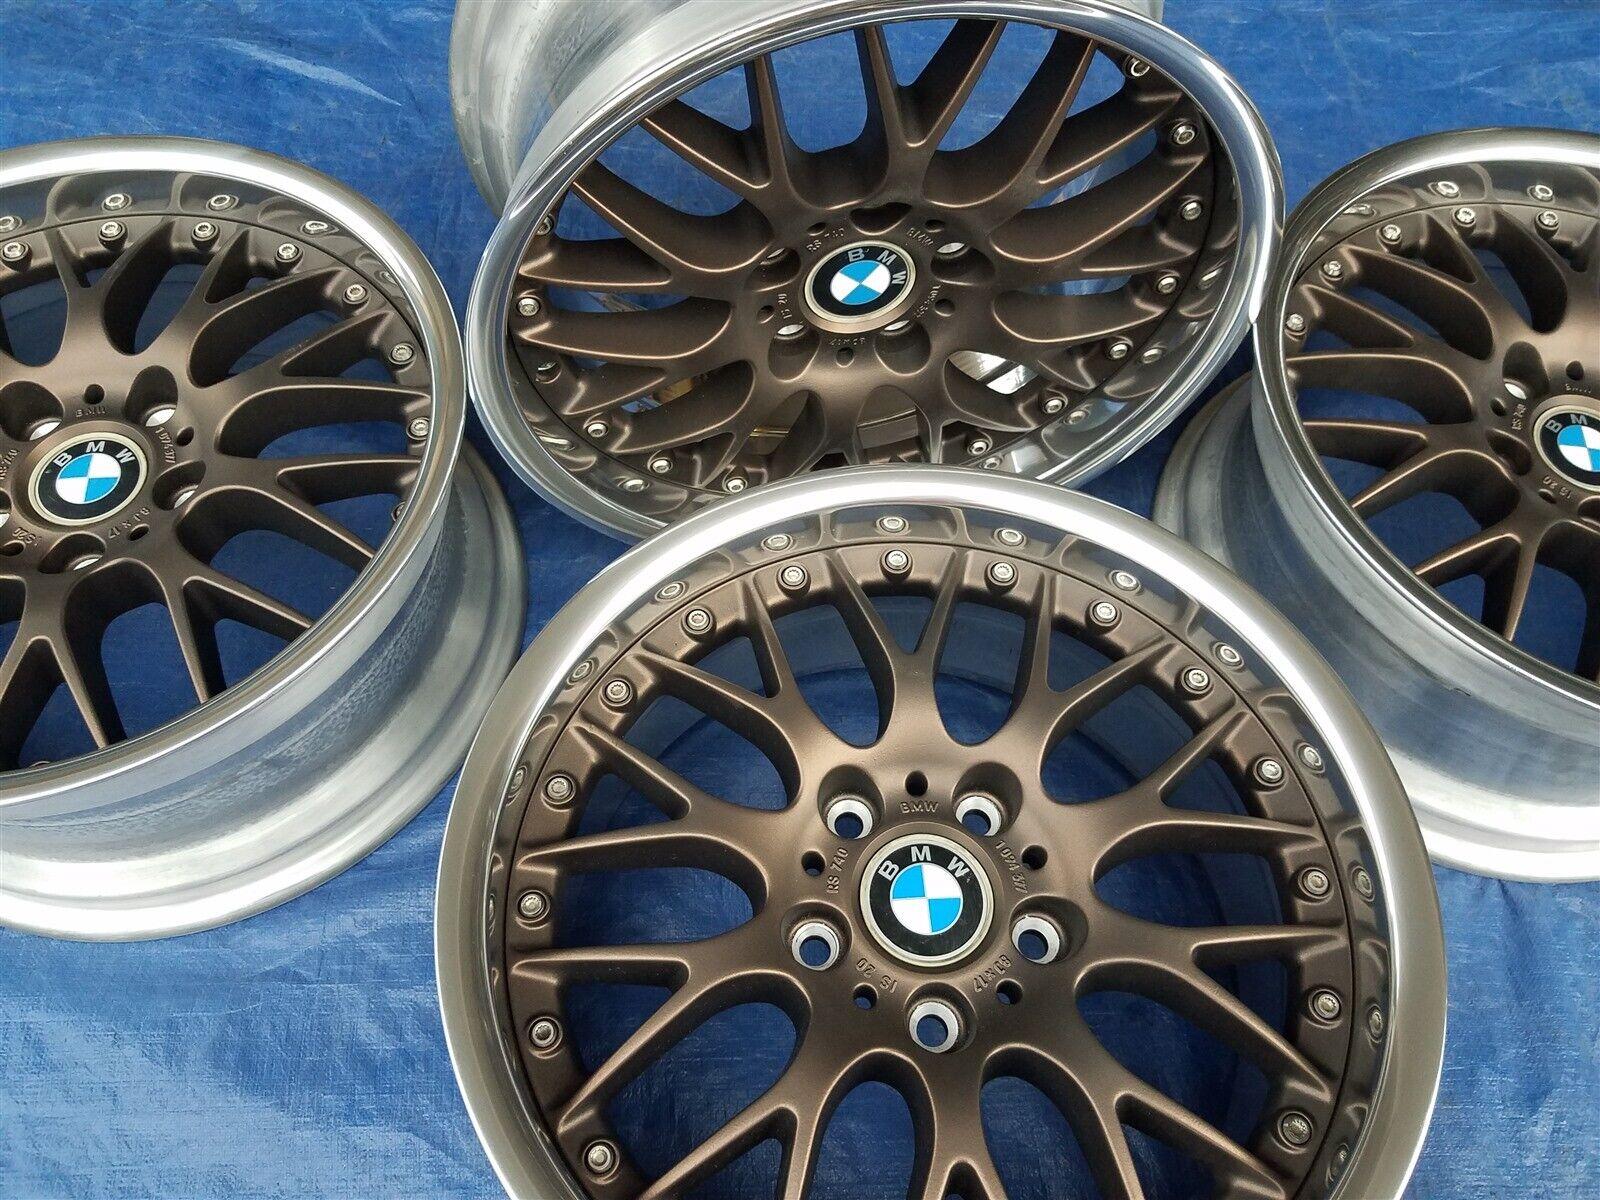 BMW E28 M5 E24 M6 E30 M3 E39 530 OEM BBS RS740 Style 42 17x8 Wheels Rims BRONZE!